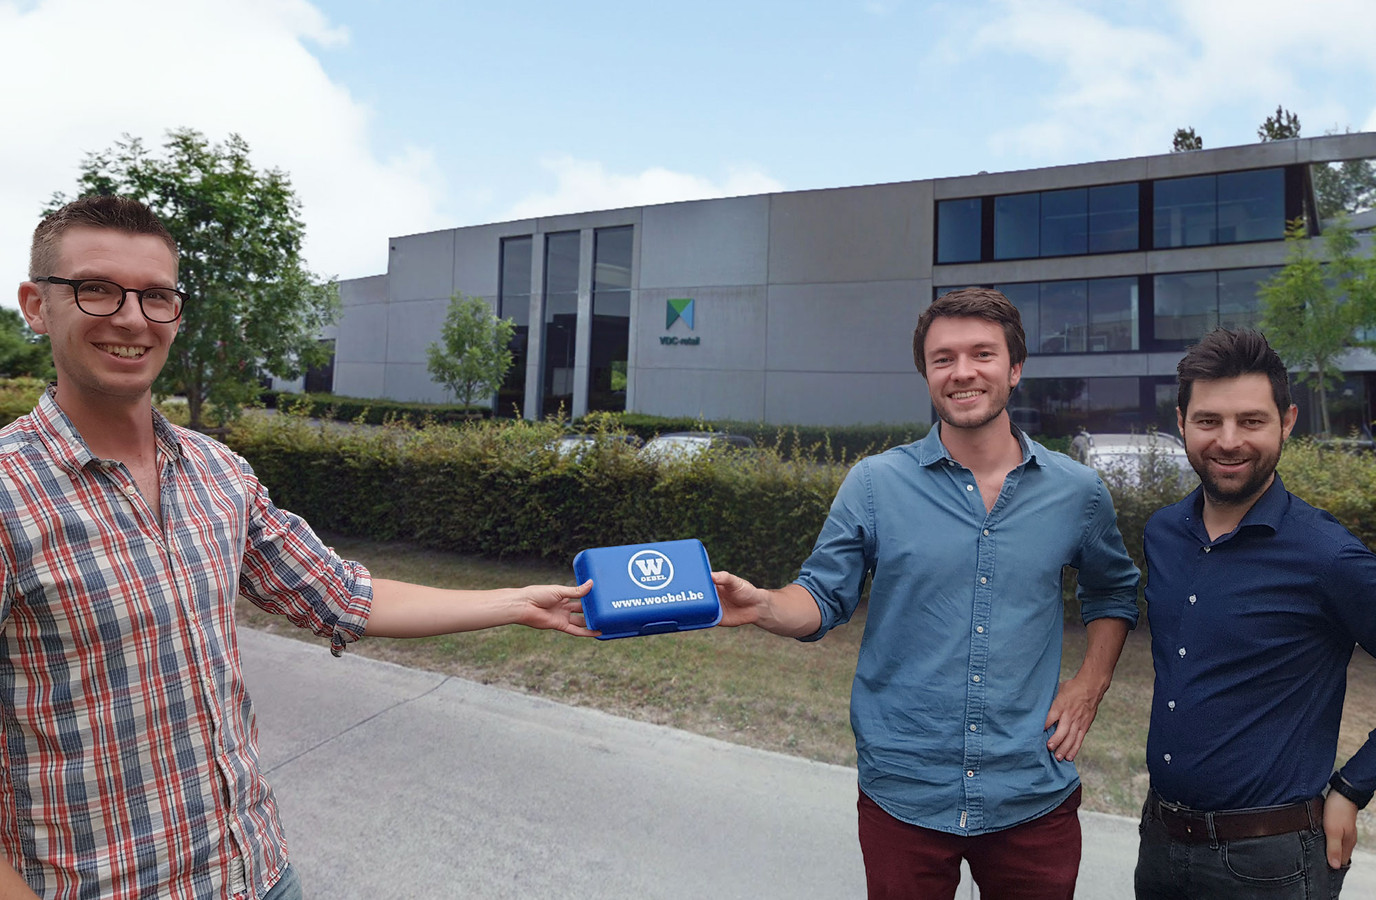 Jonas Van Gool, Lukas Van Orshoven en Niels Vanden Buverie.